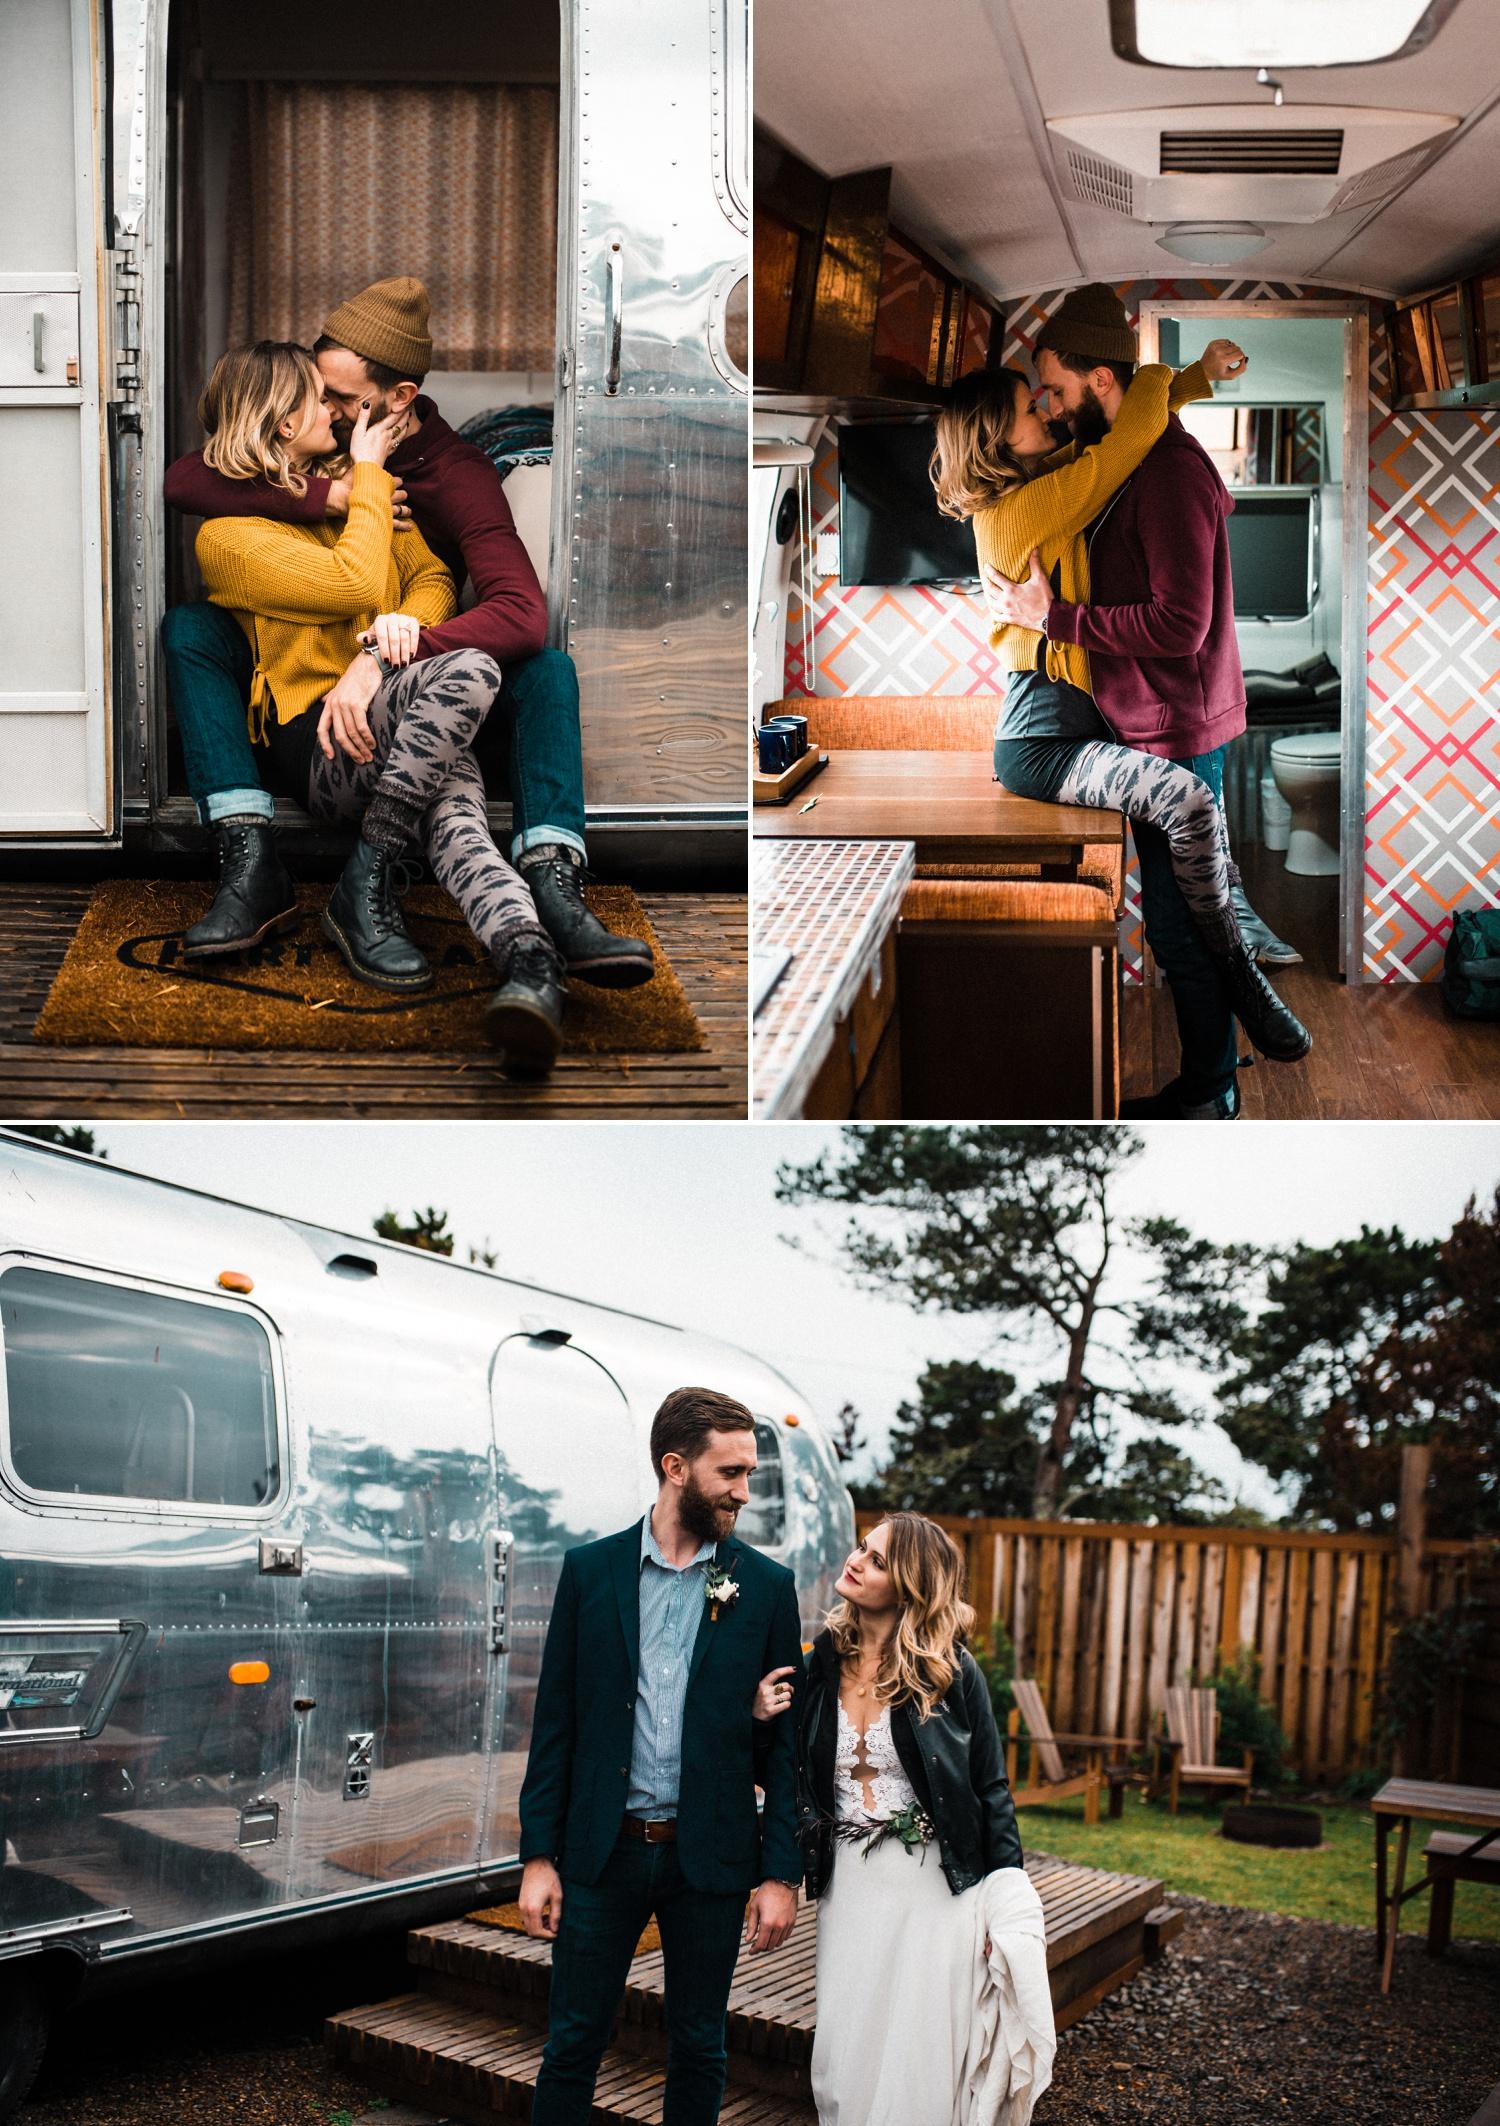 Oregon_Coast_Elopement_Wedding_The_Foxes_Photography_028-1.jpg